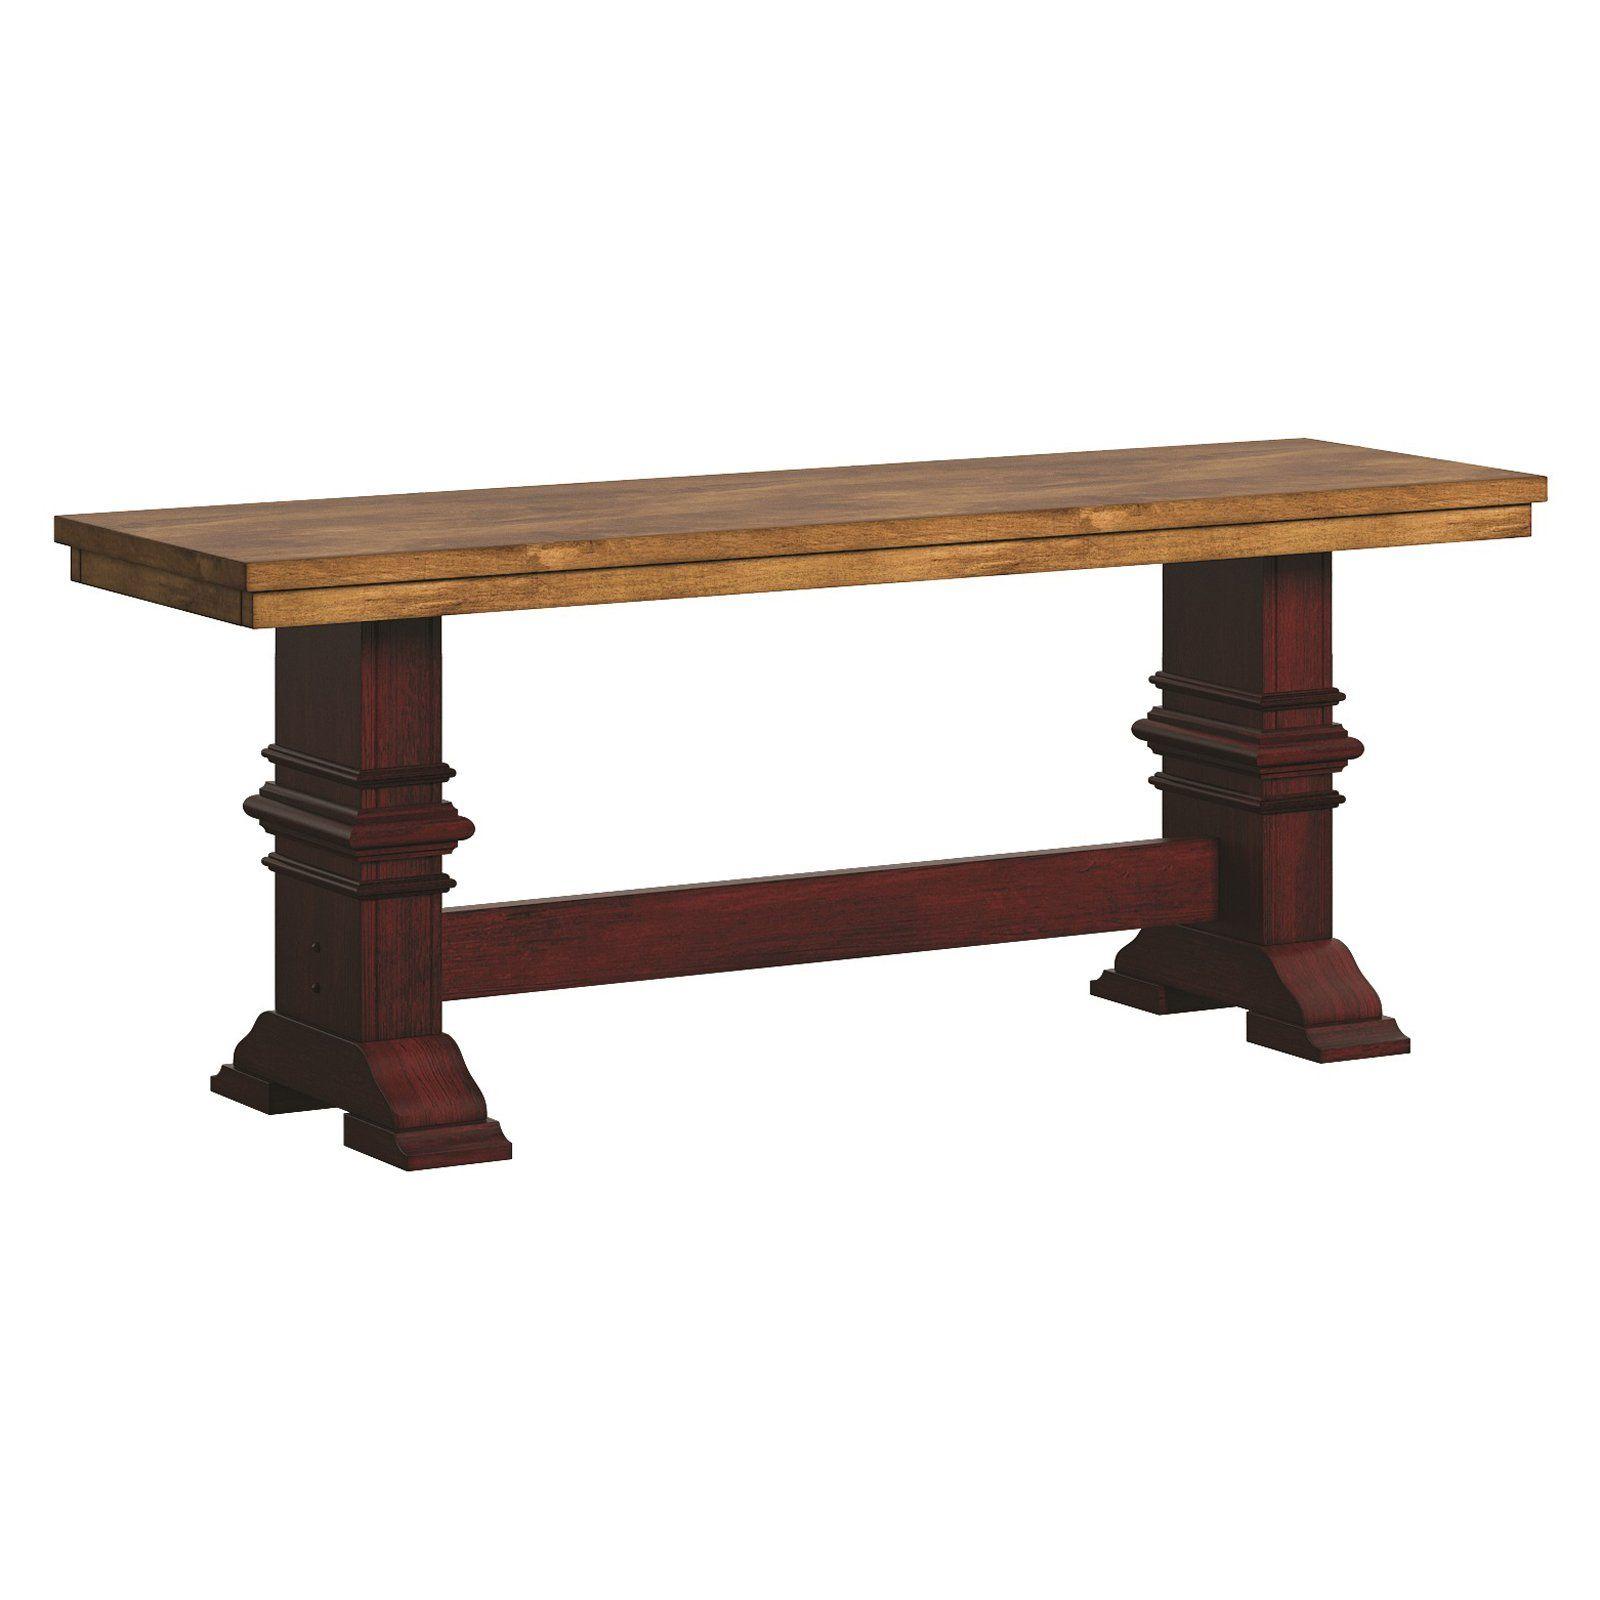 Fine Weston Home Farmhouse Dining Bench With Trestle Leg Beatyapartments Chair Design Images Beatyapartmentscom